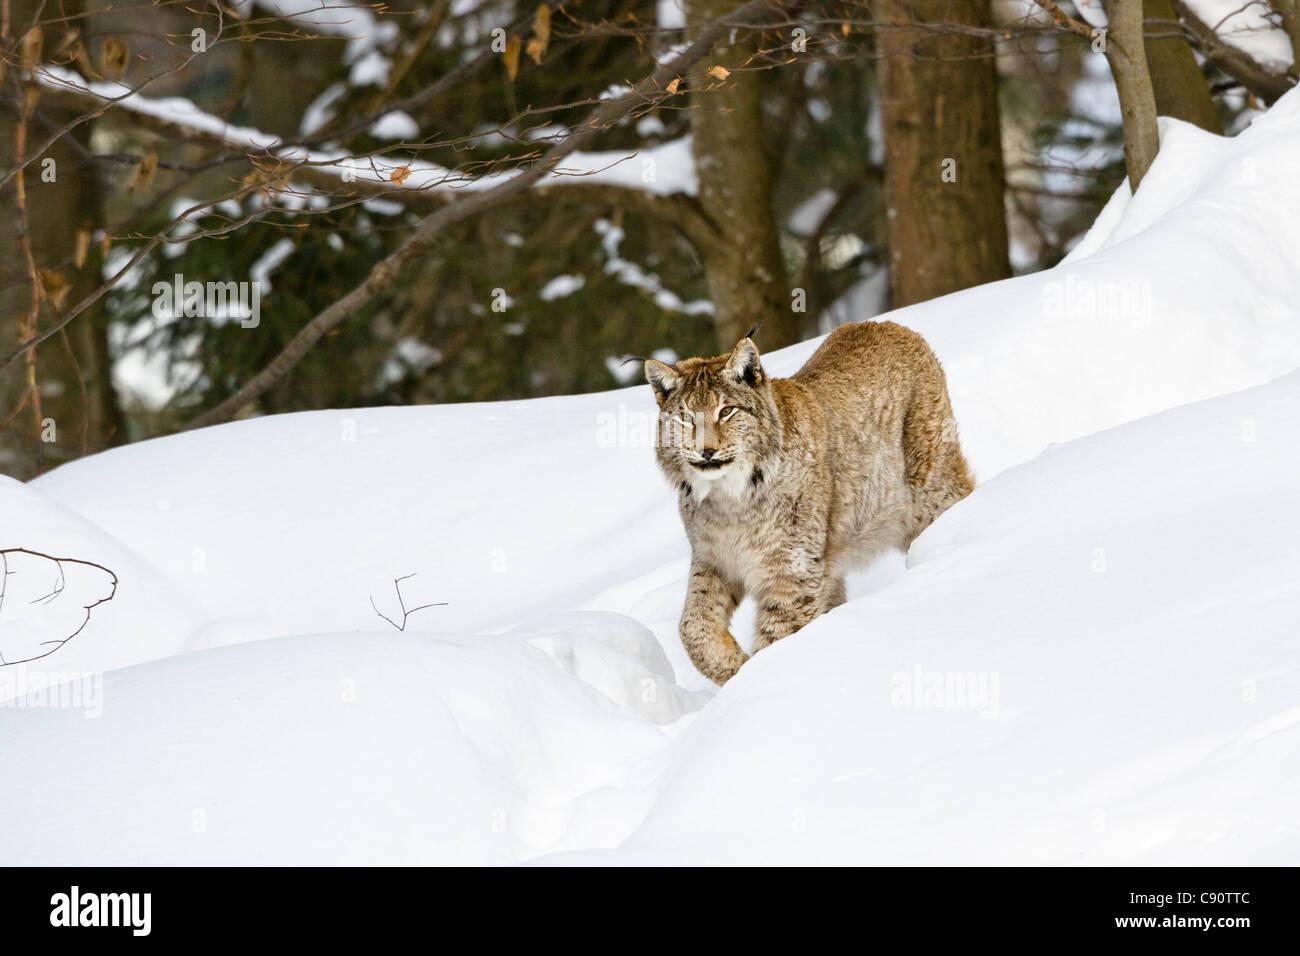 European lynx in the snow, Bavarian Forest National Park, Bavaria, Germany, Europe Stock Photo